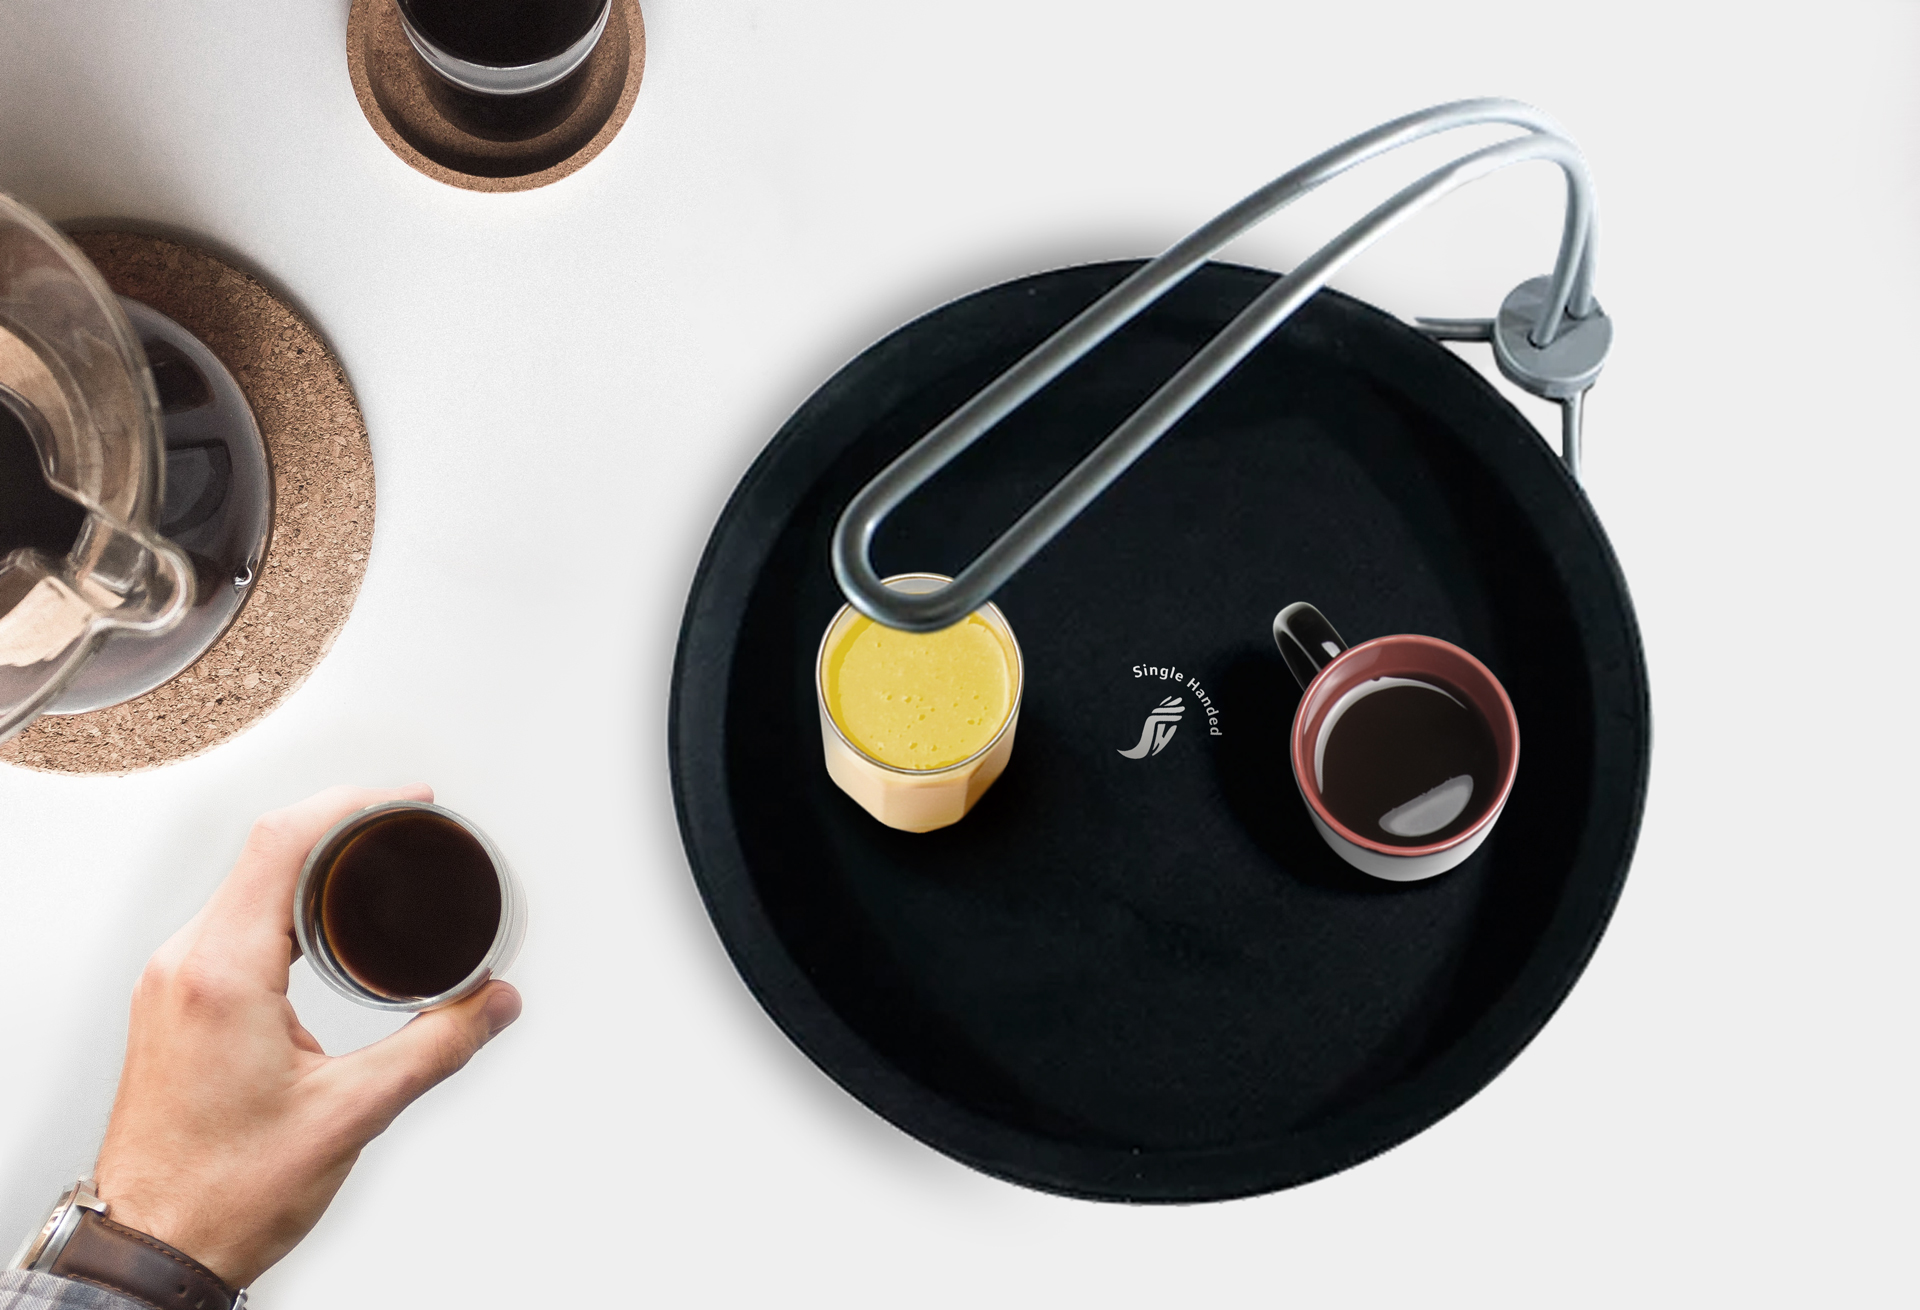 kickstarter-packaging-and-branding-graphic-design